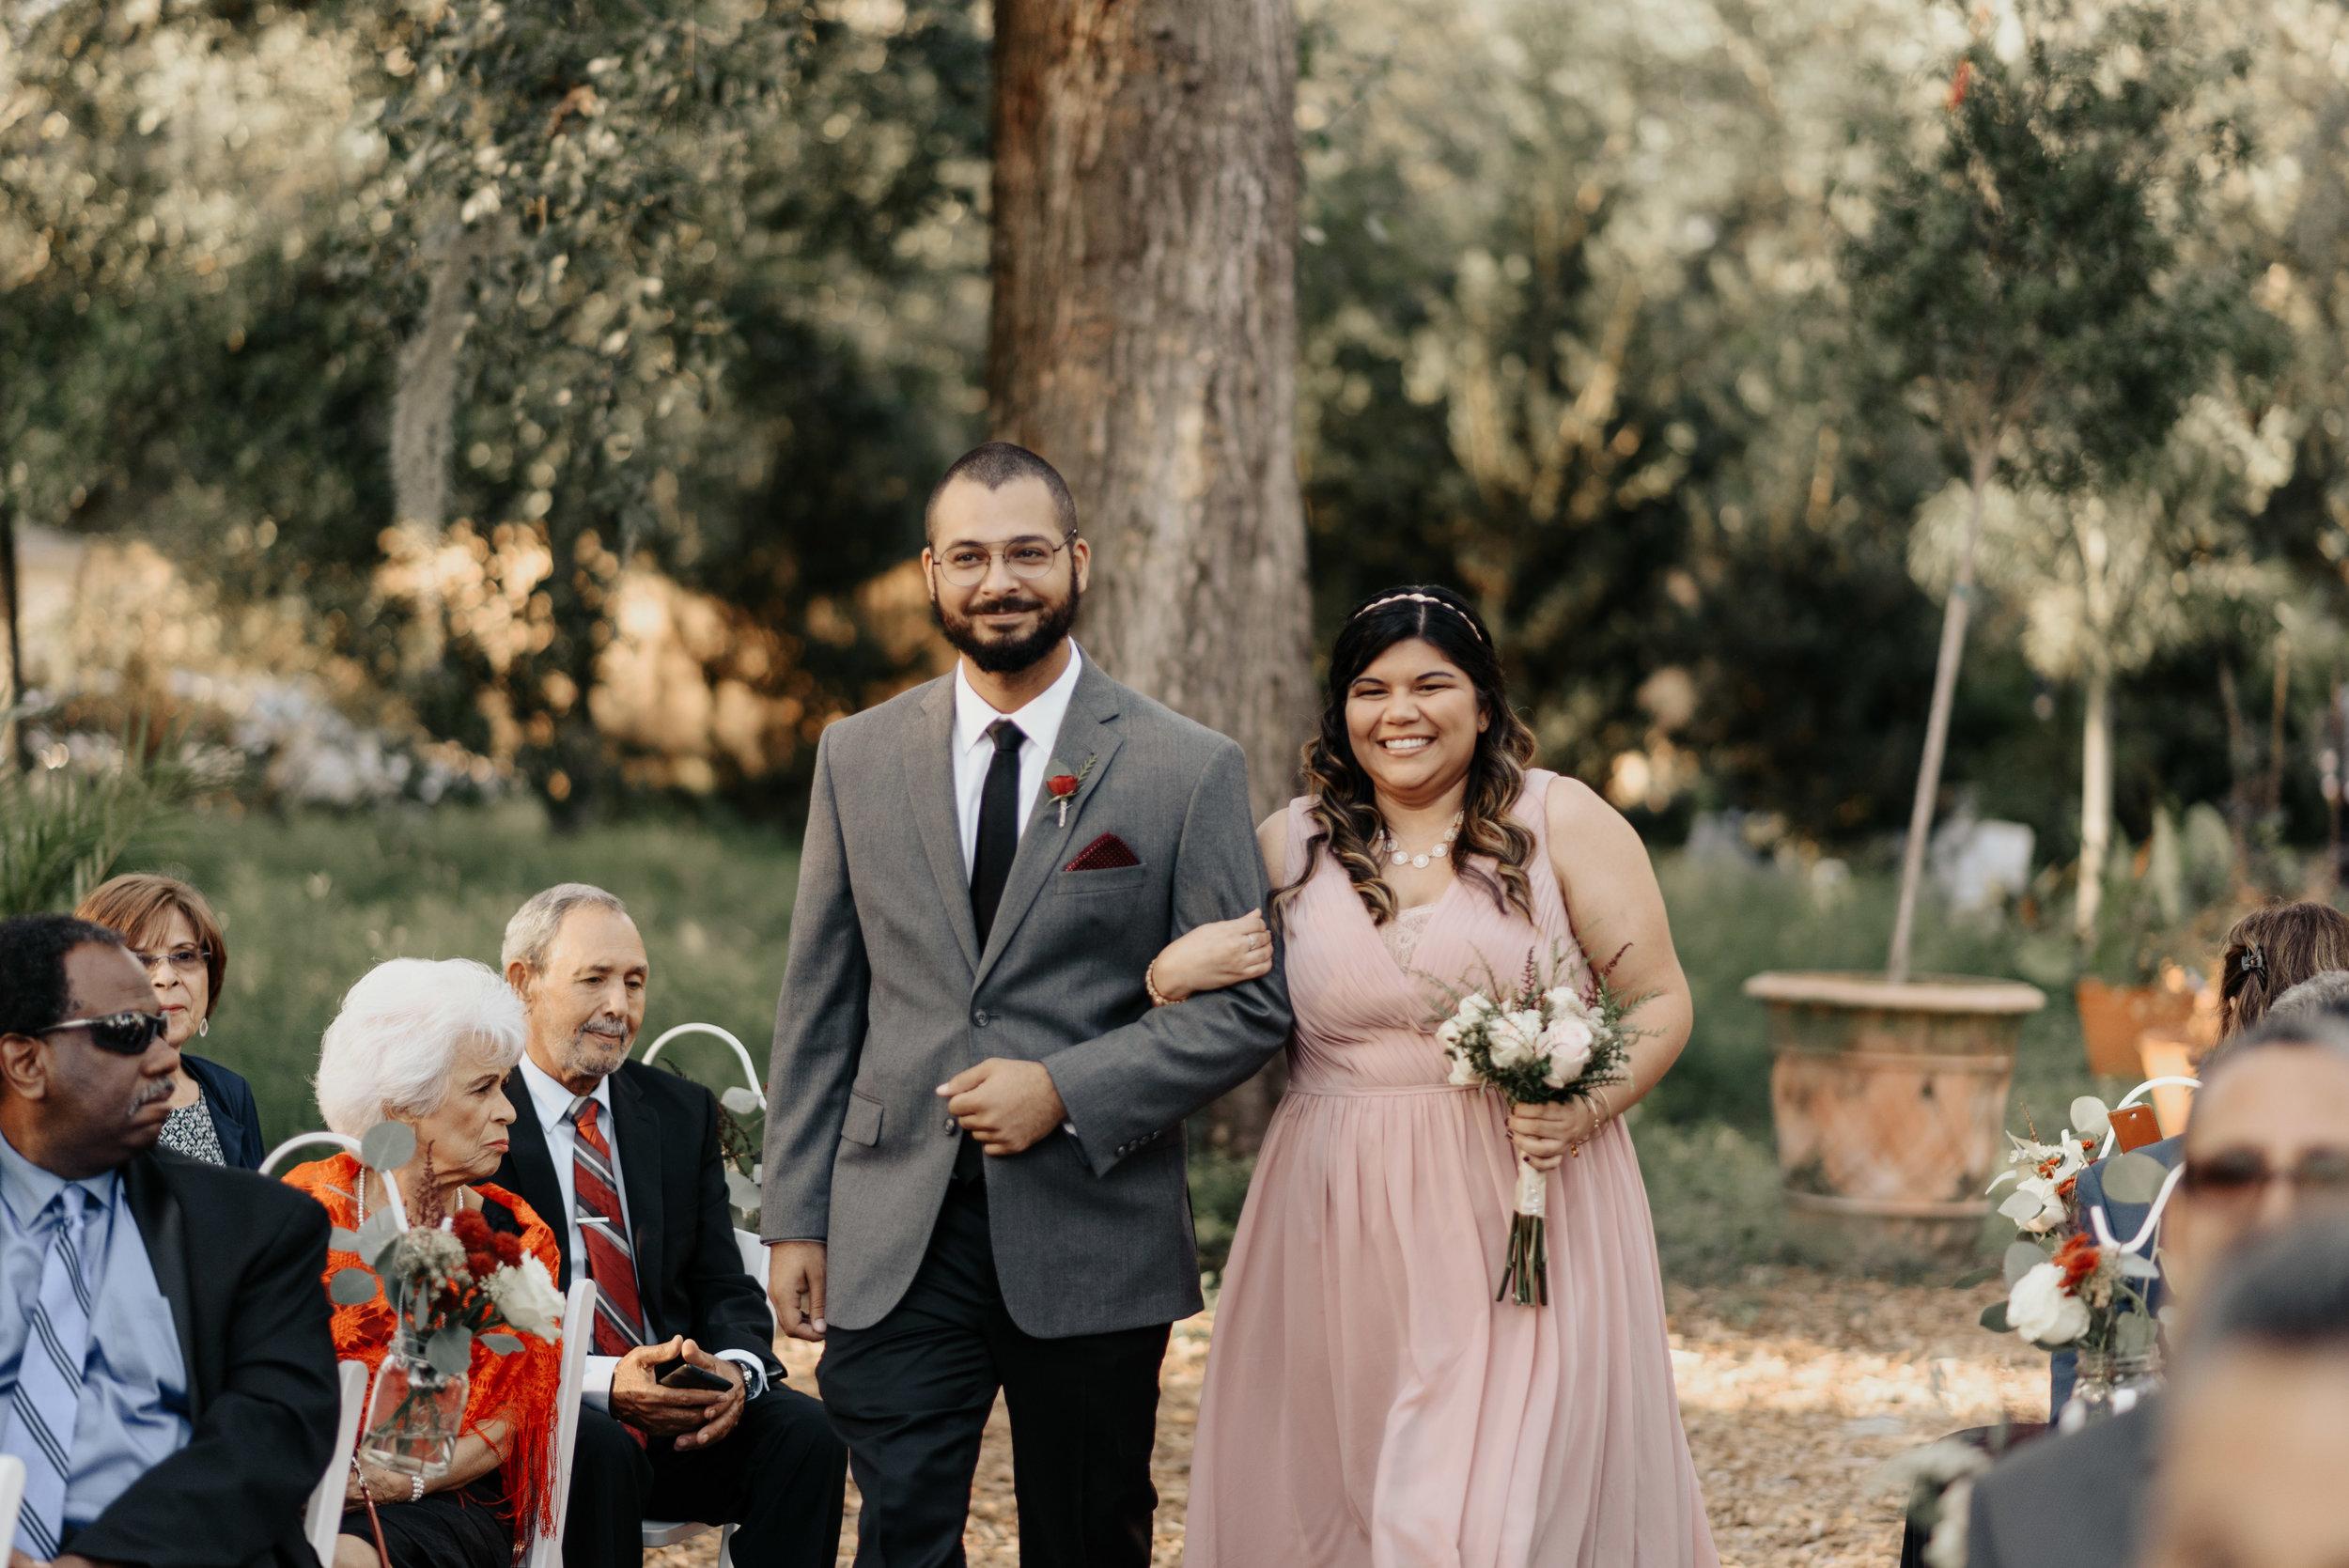 Kirstie-AJ-Wedding-9880.jpg